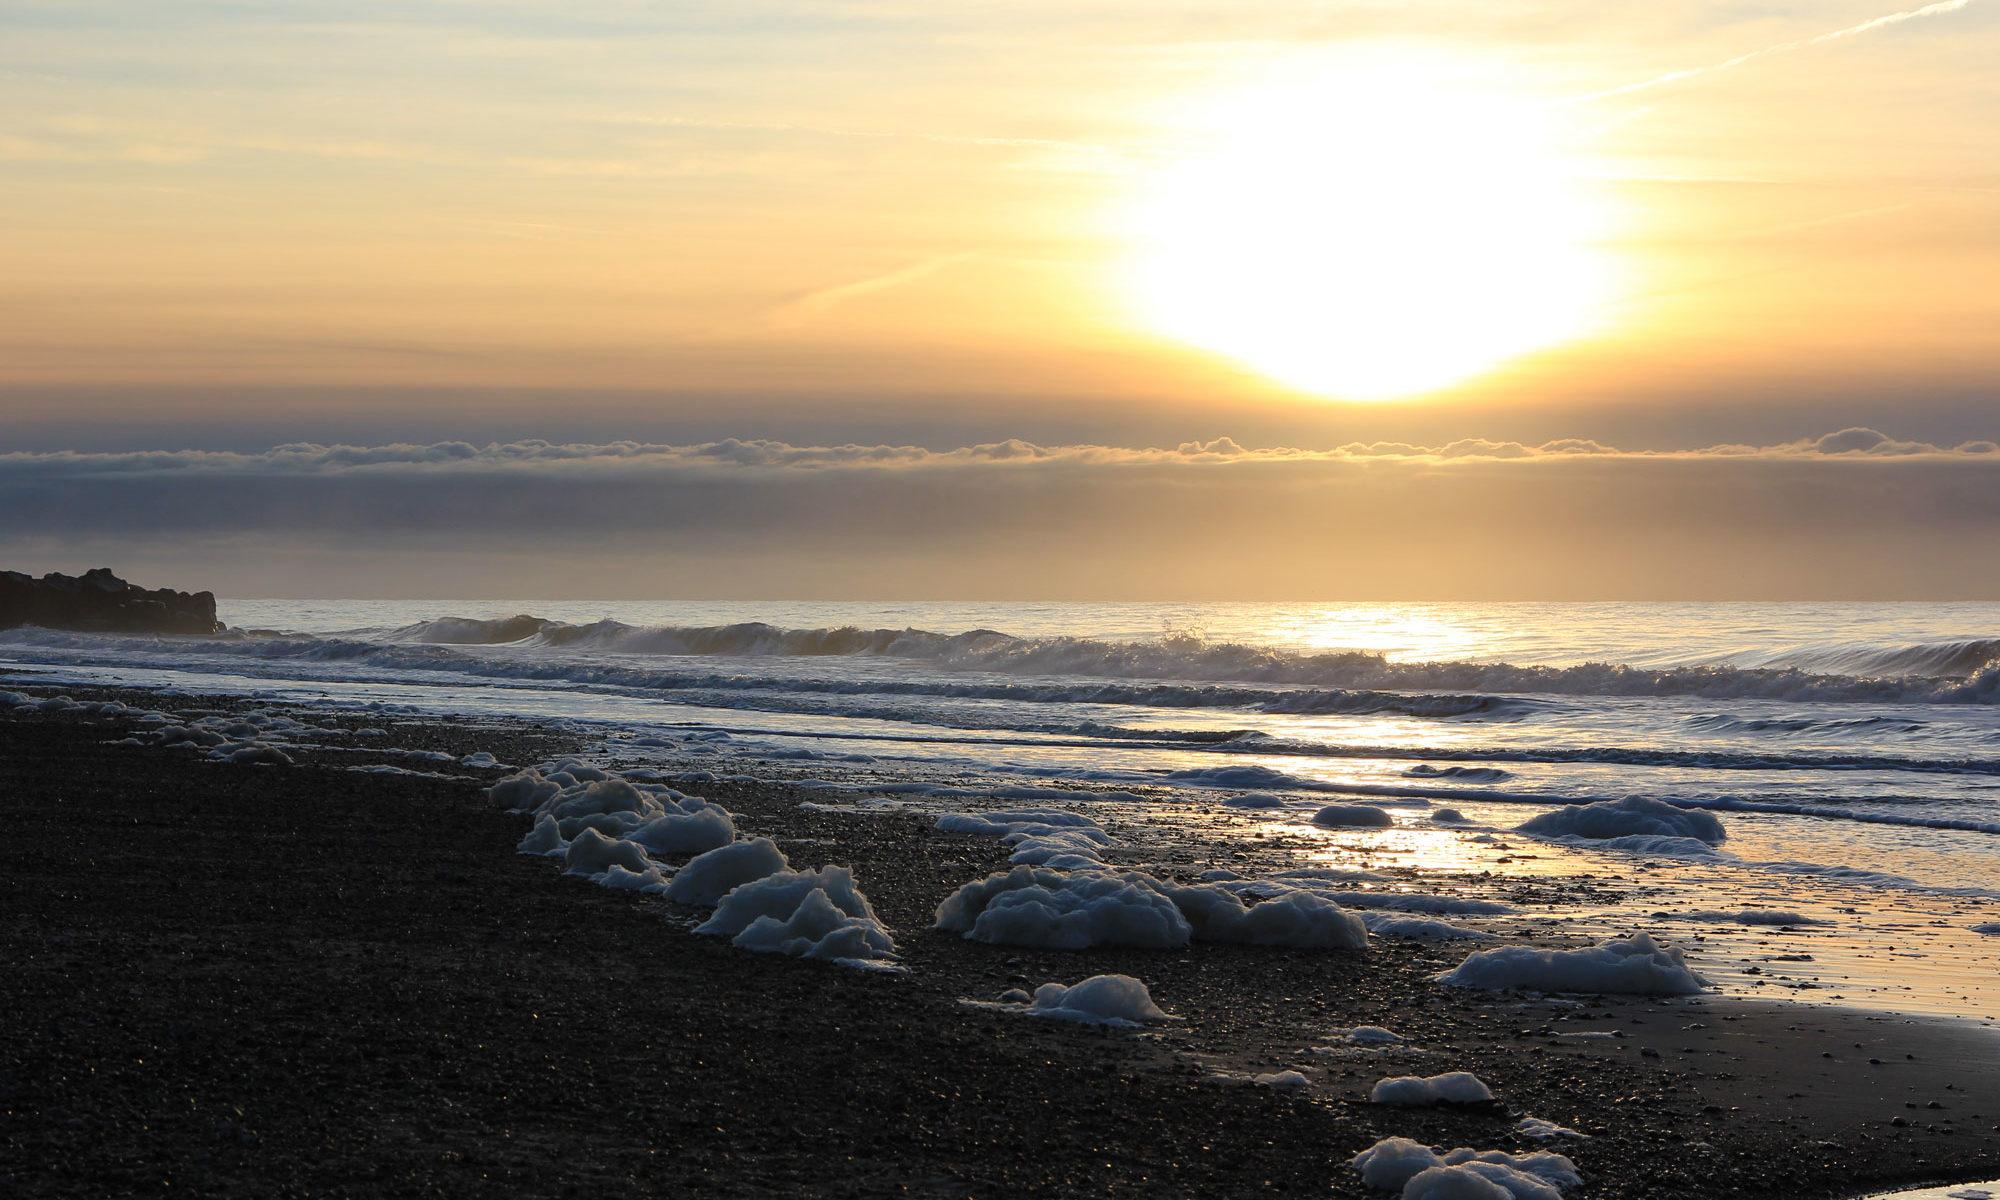 Nordsee Schaumstrand - Ralf Struß